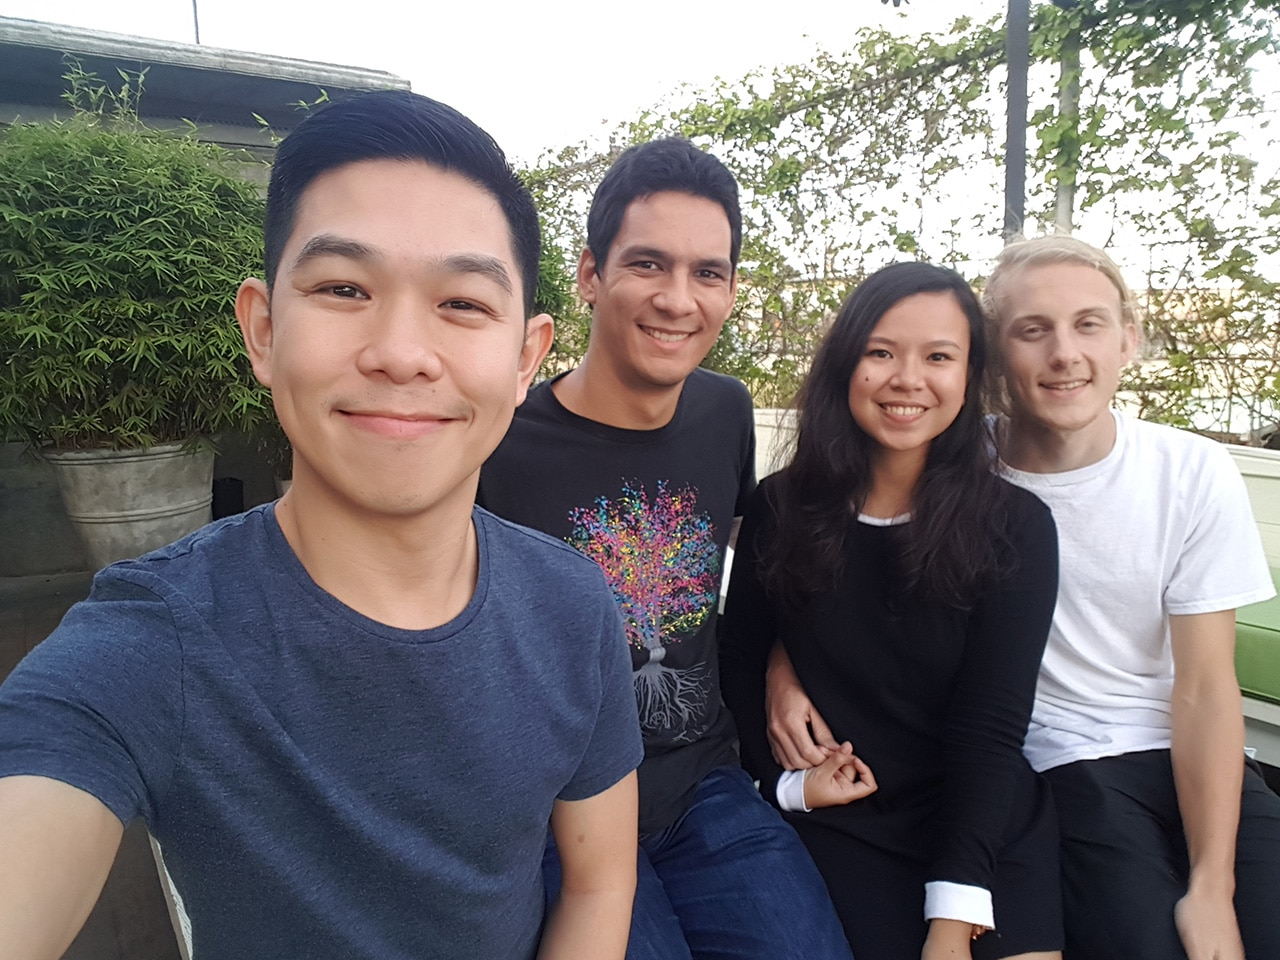 2016-gadgetmatch-photo-comparison-group-selfie-samsung-galaxy-s7-edge